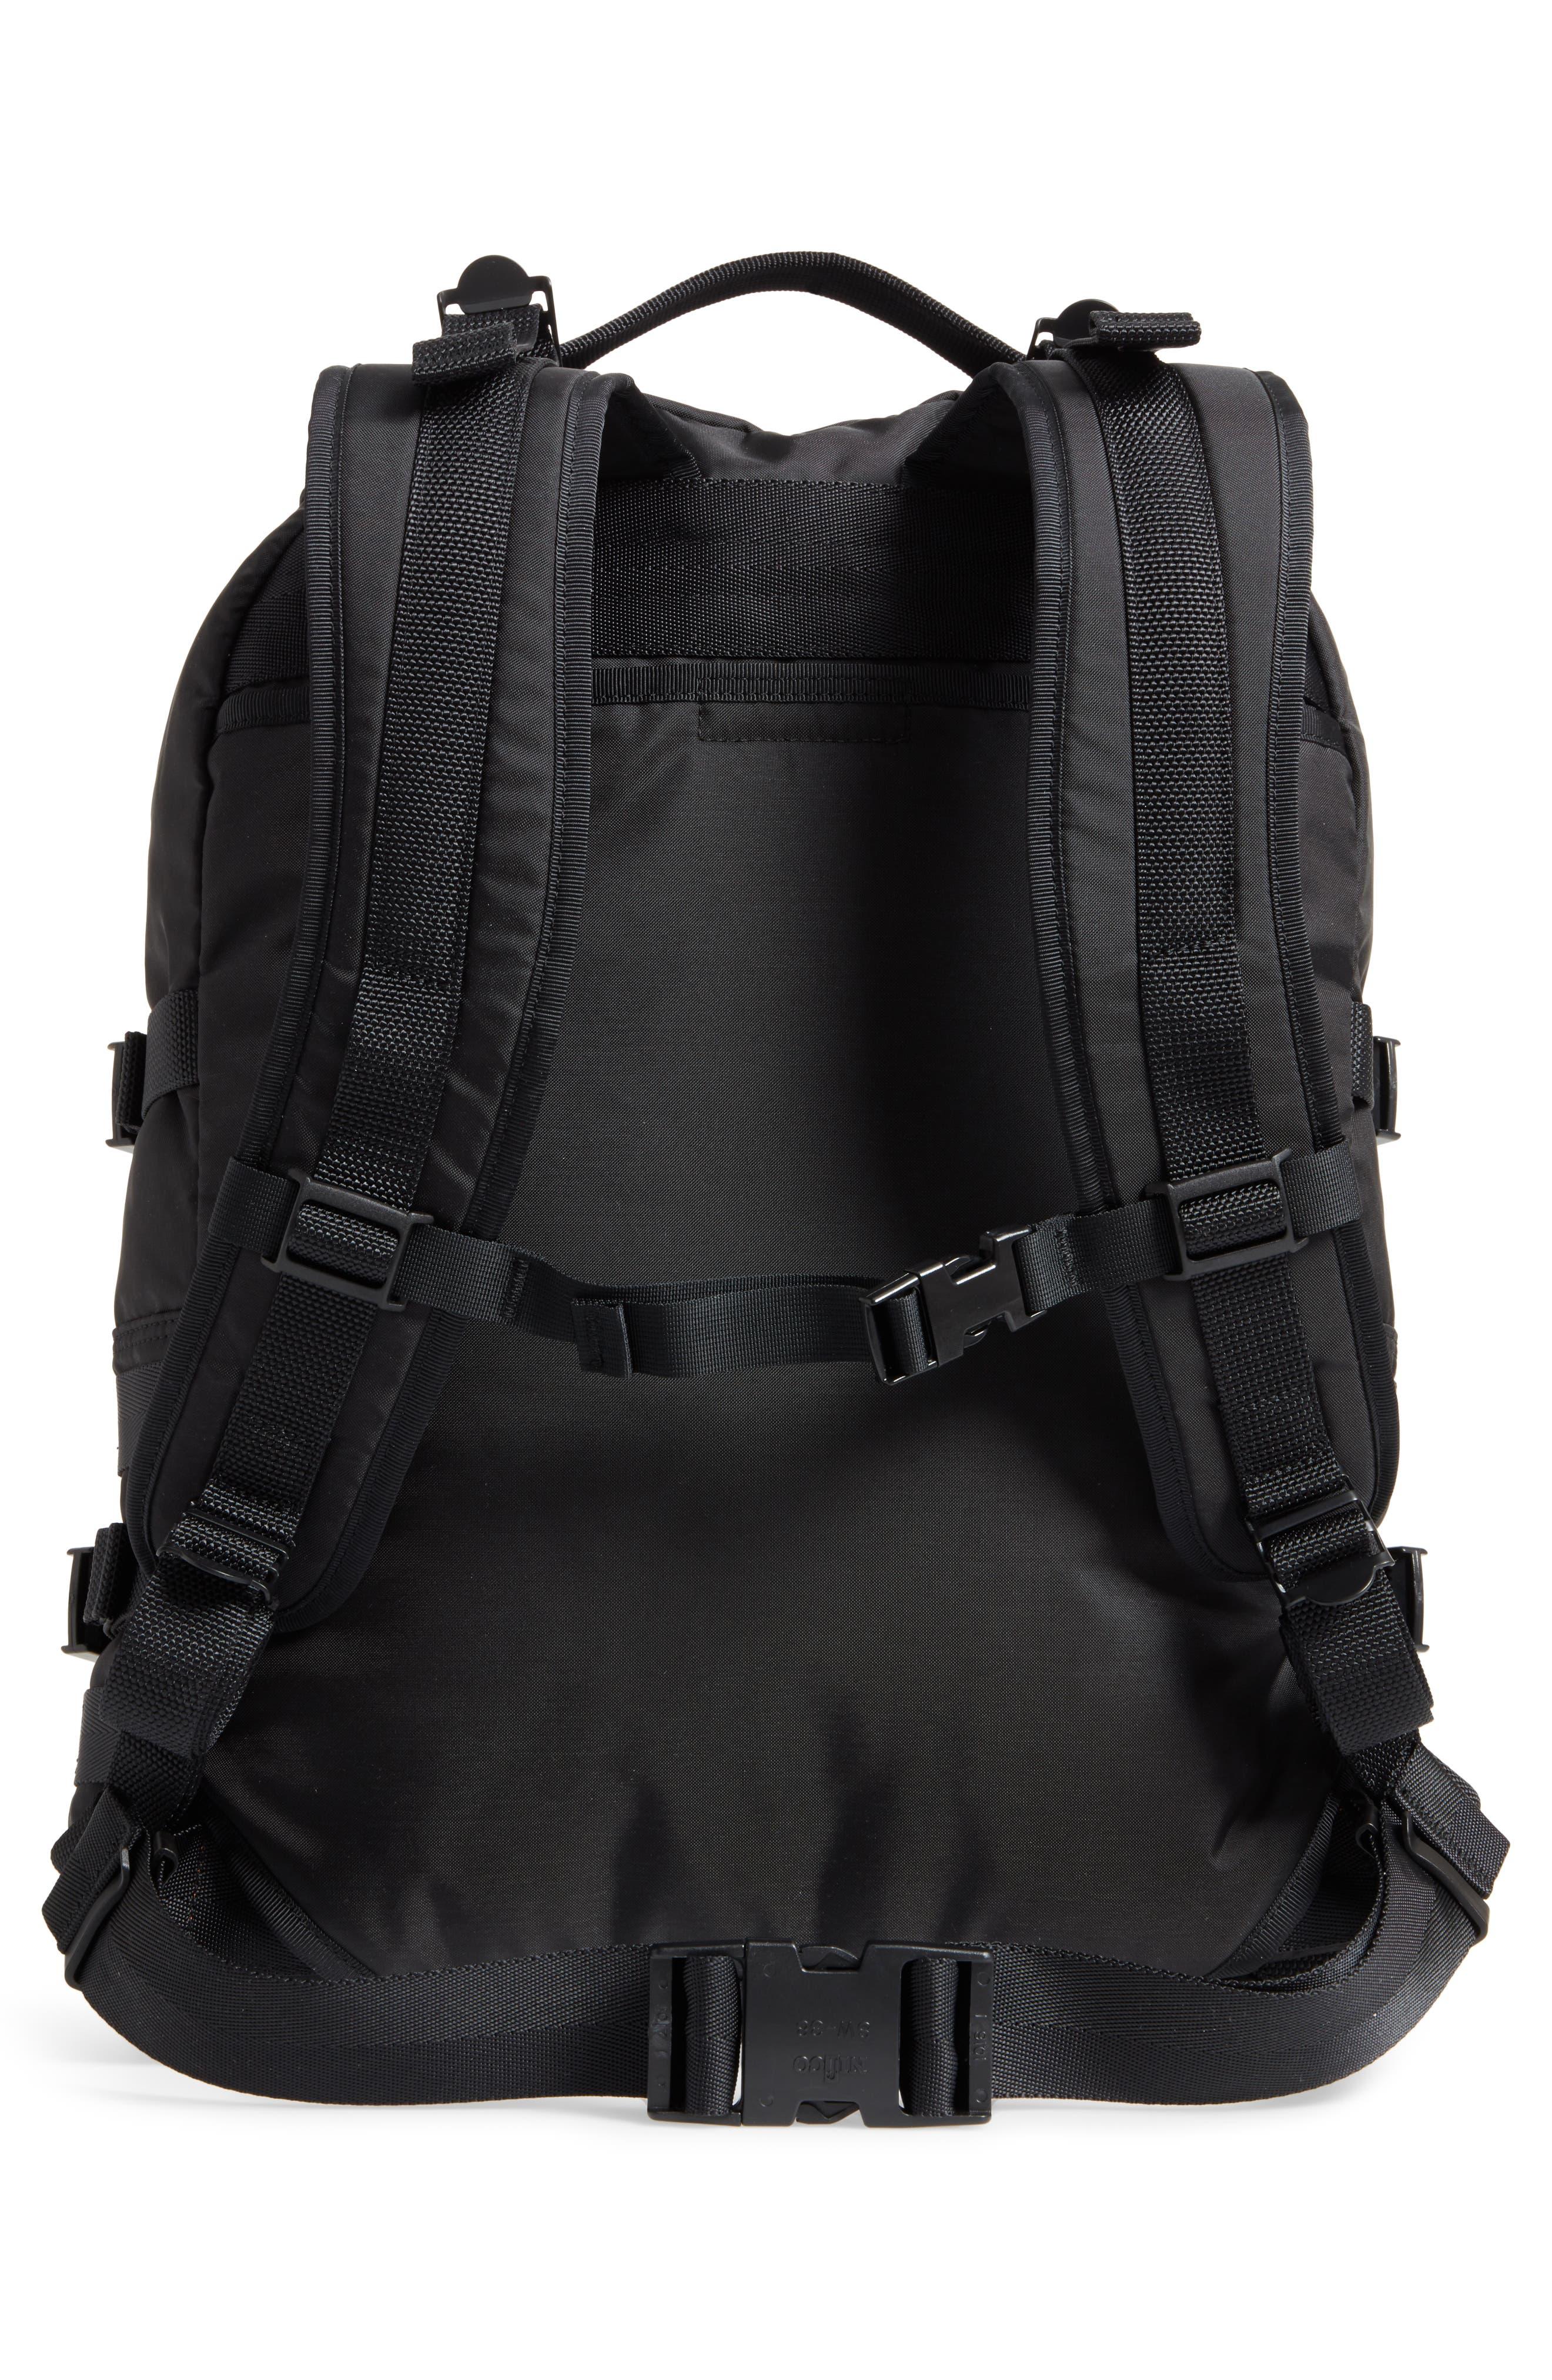 Porter-Yoshida & Co. Force Backpack,                             Alternate thumbnail 3, color,